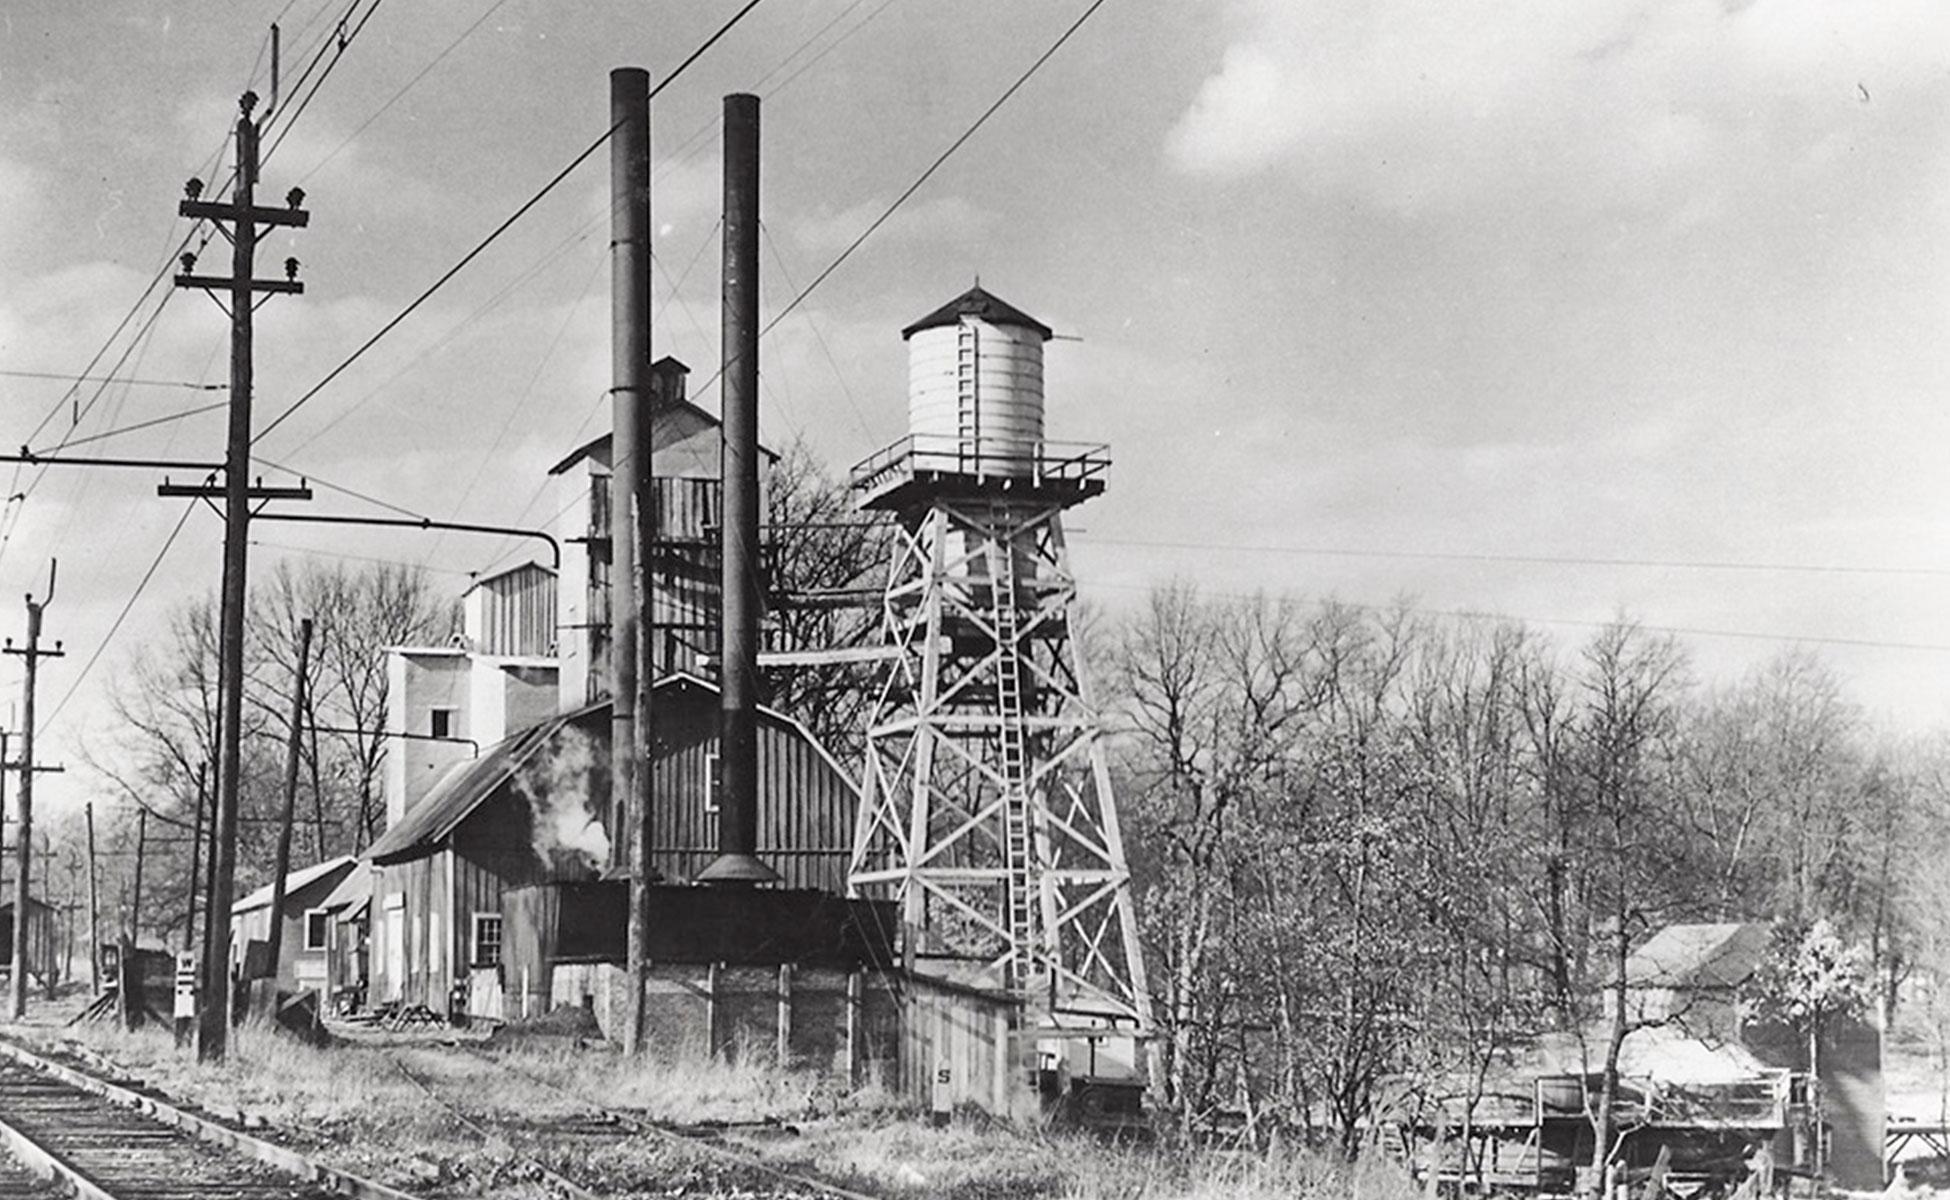 Virginia's Oldest and Most Award Winning Distillery